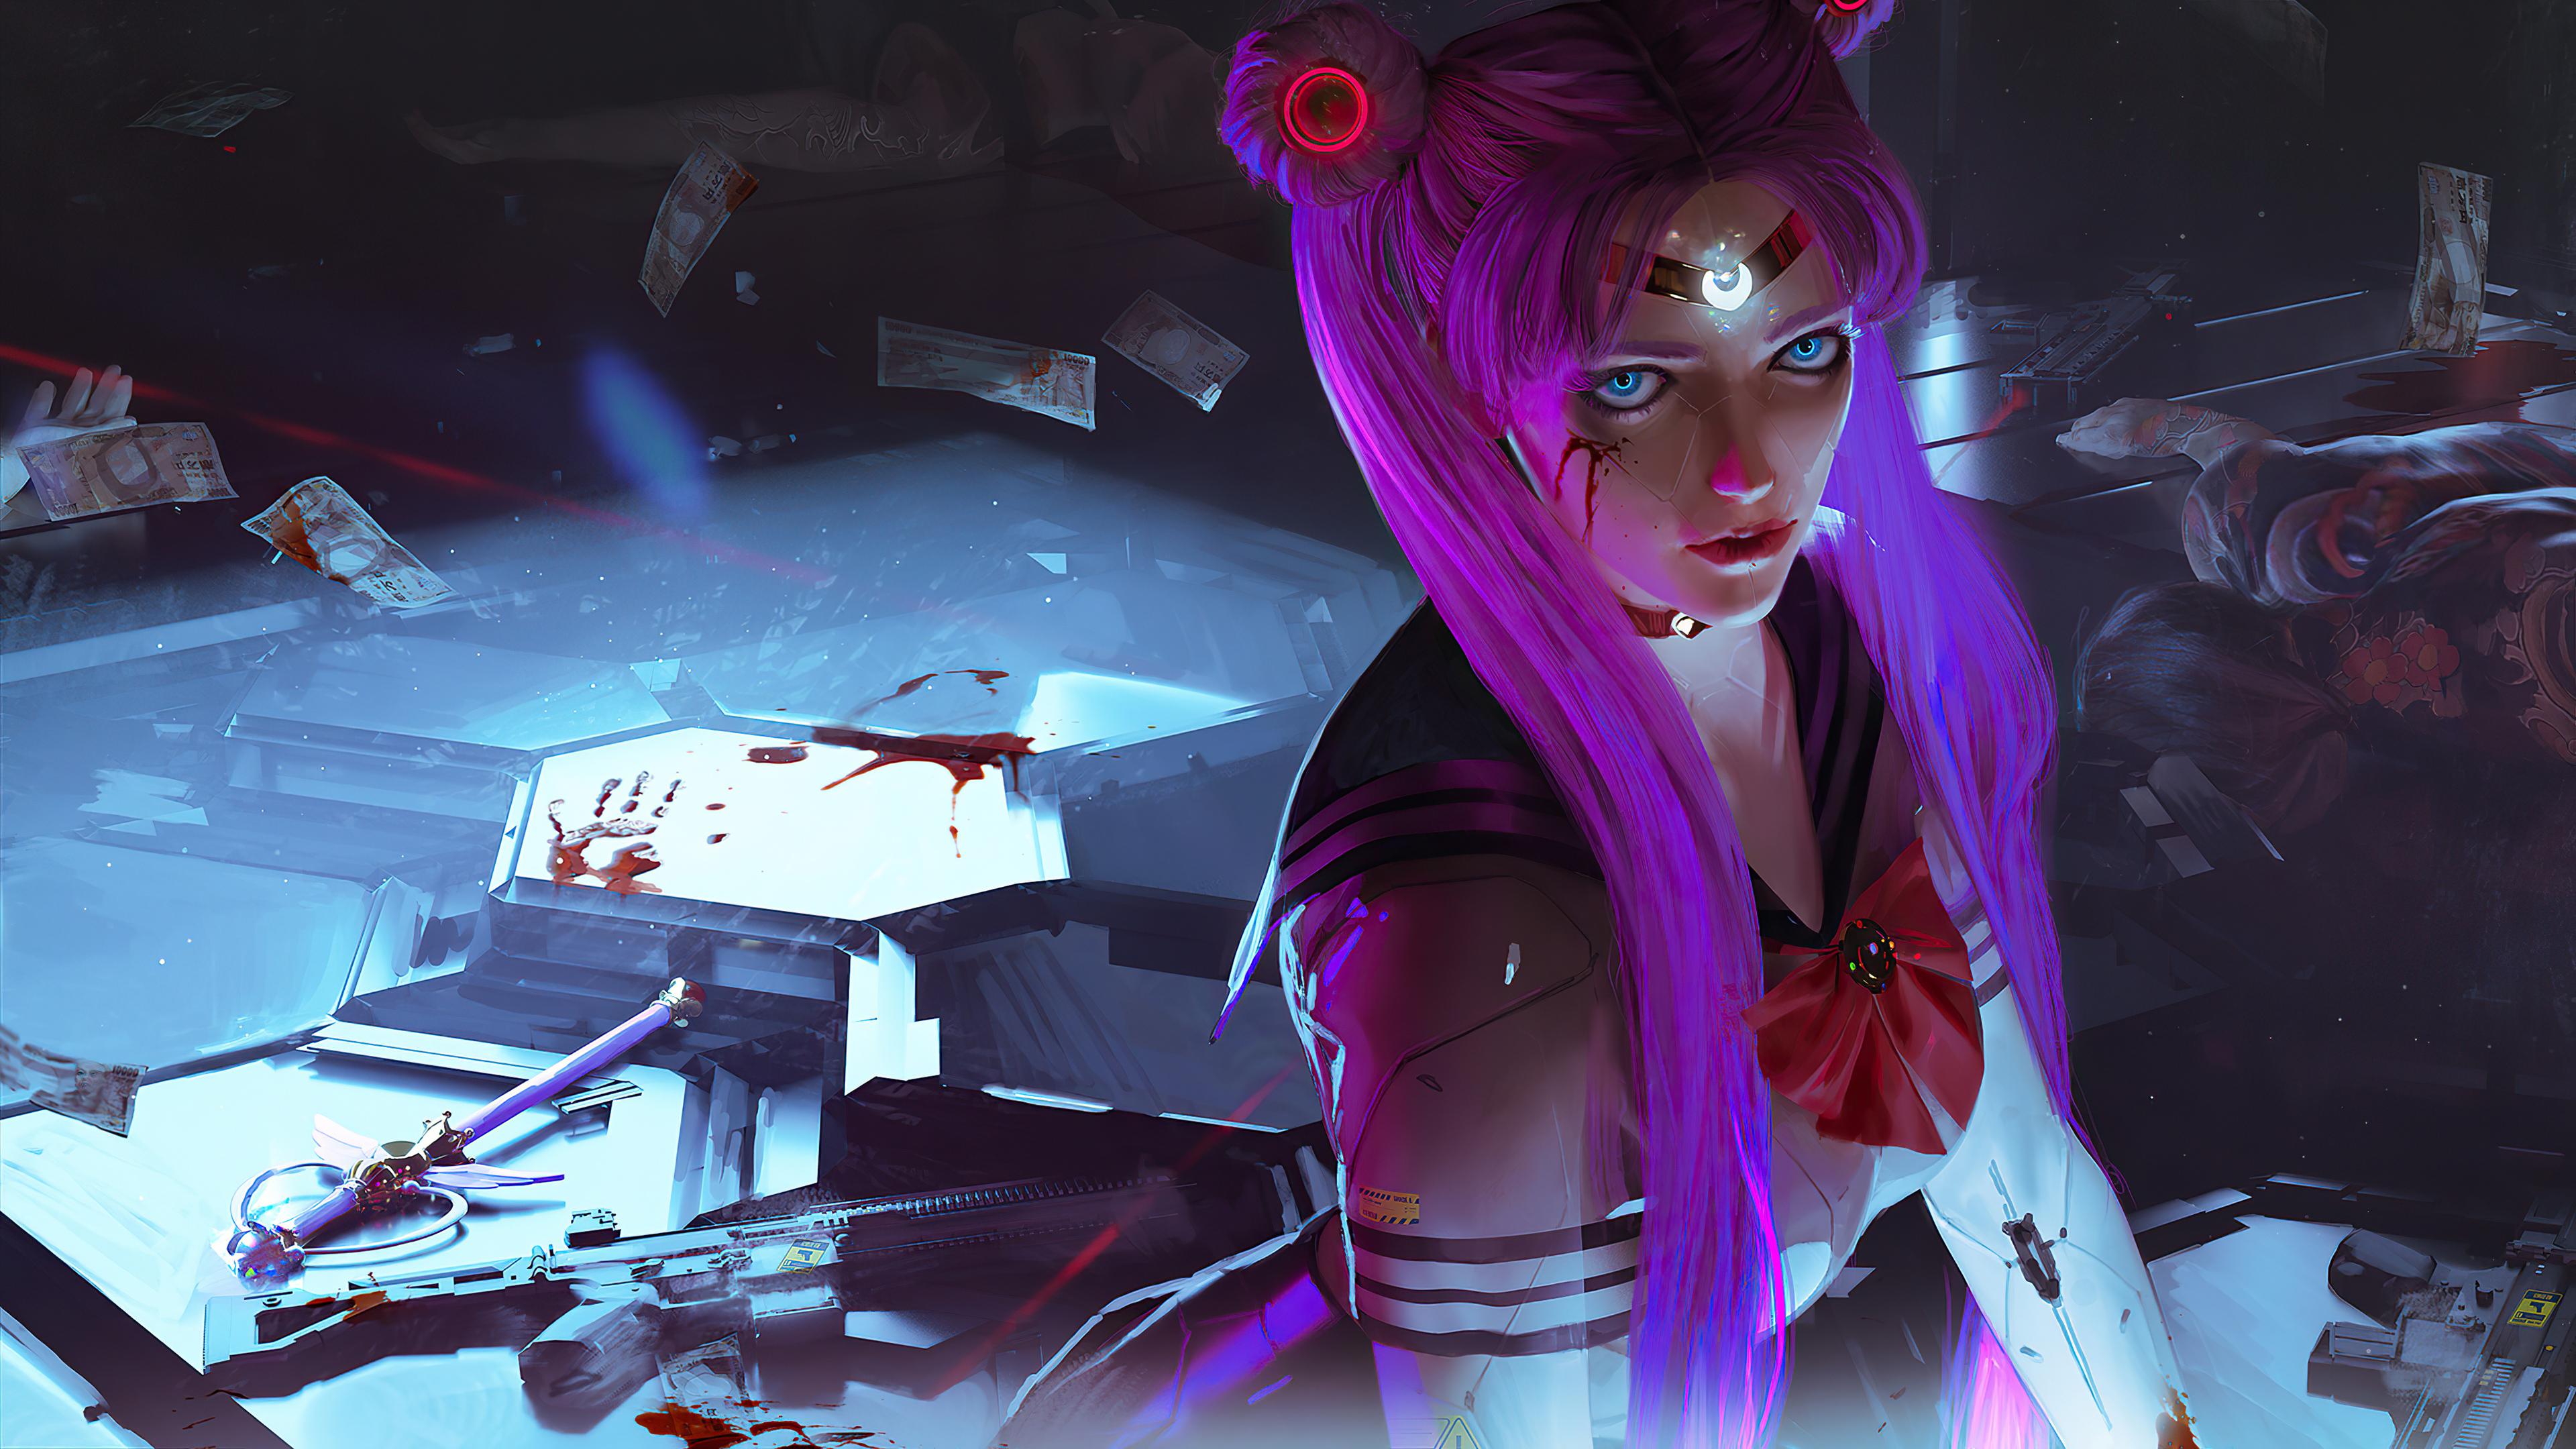 sailor moon cyberpunk girl 4k 1608658977 - Sailor Moon Cyberpunk Girl 4k - Sailor Moon Cyberpunk Girl 4k wallpapers